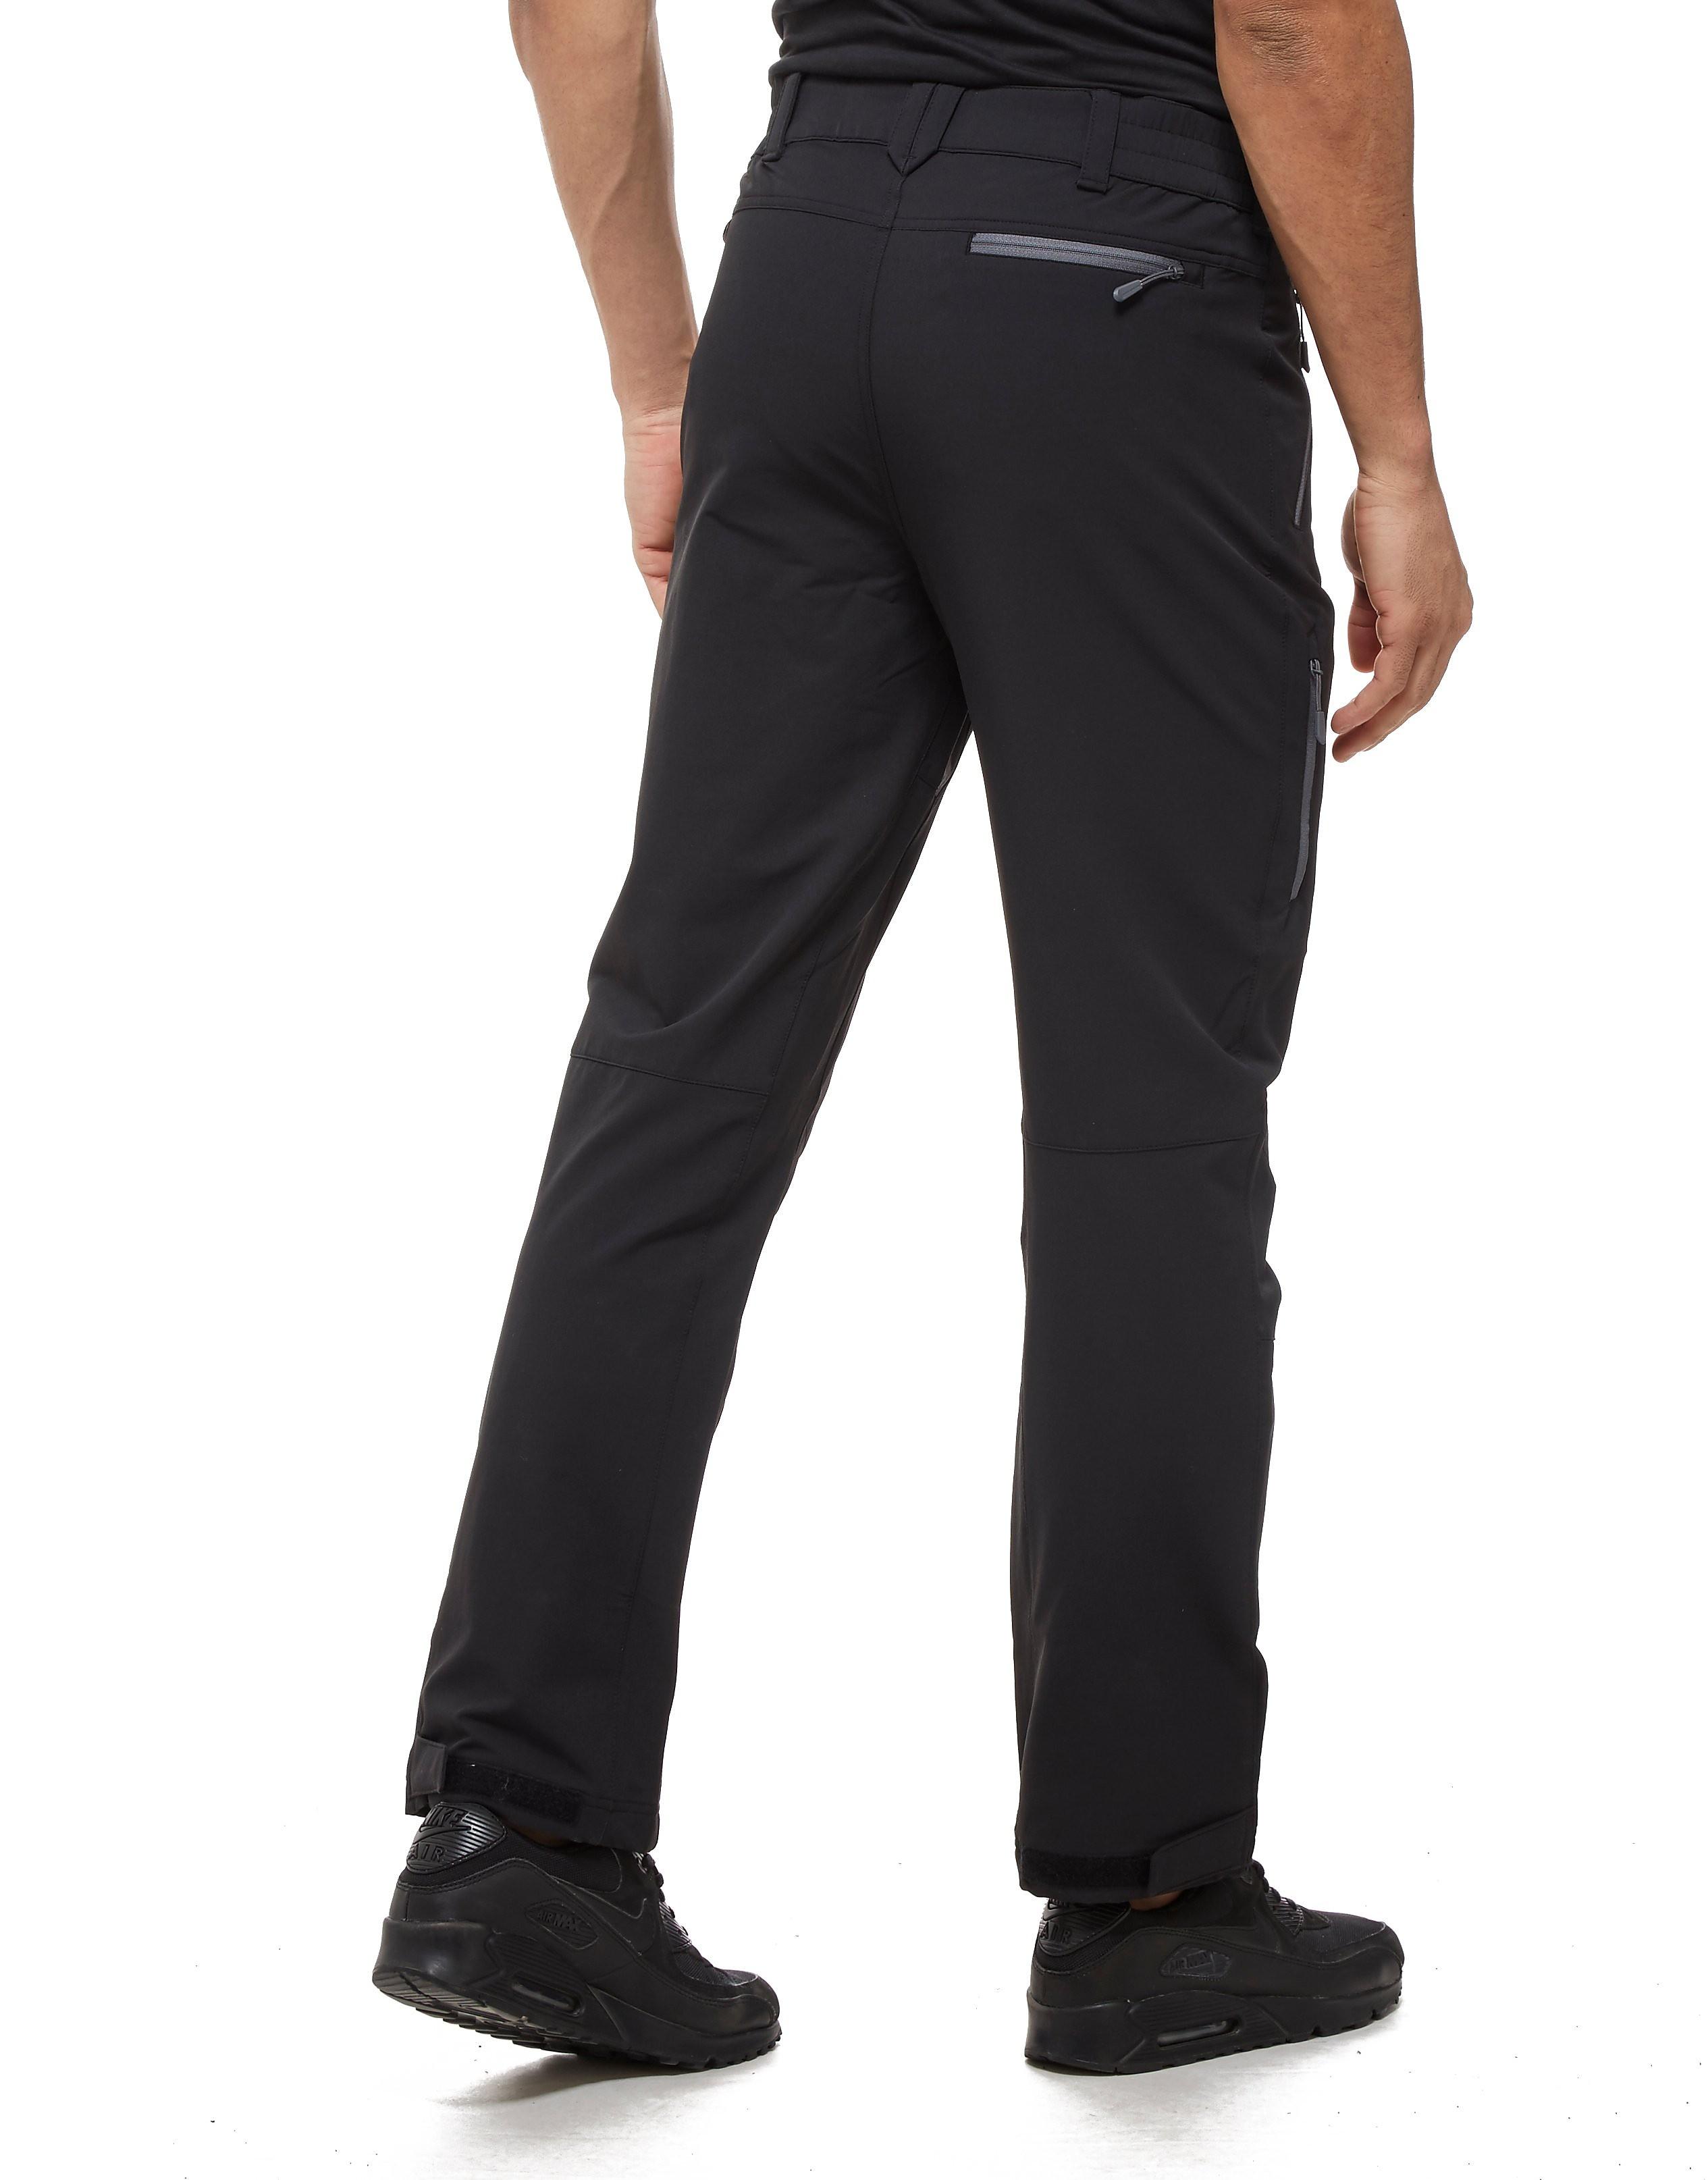 Jack Wolfskin Softshell Trousers